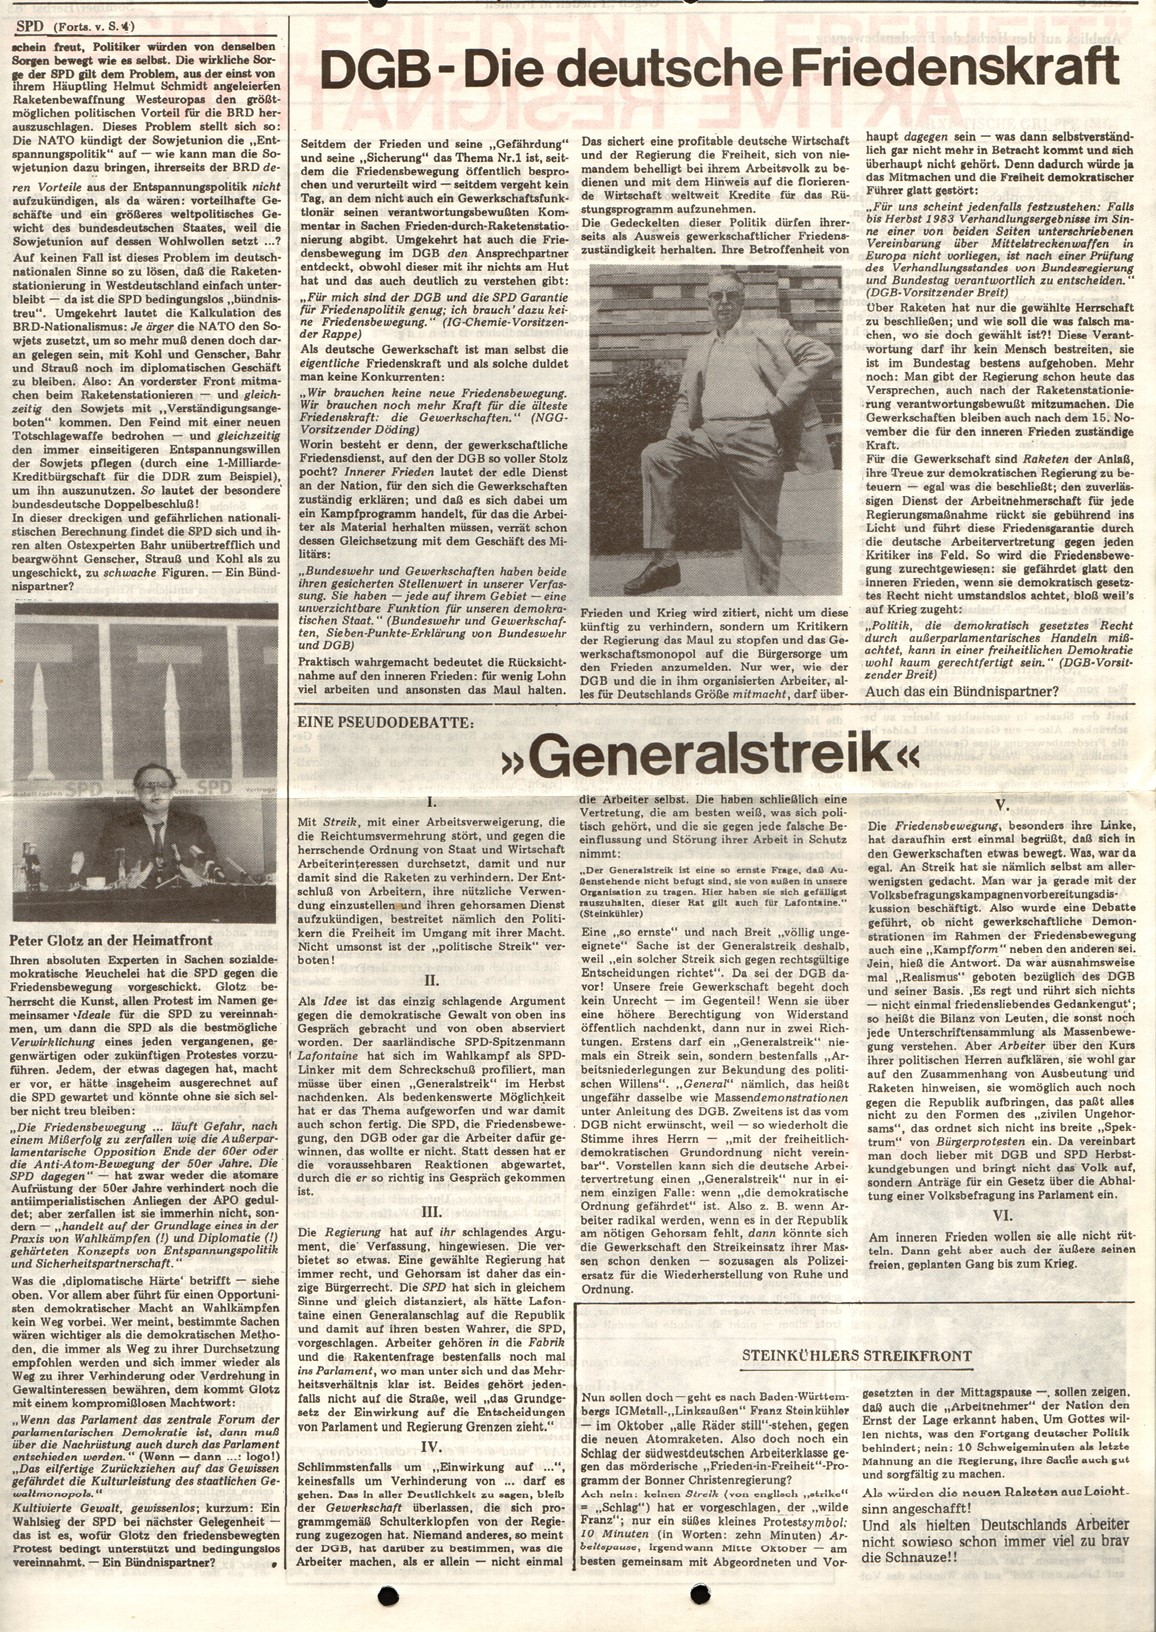 Berlin_MG_FB_19830800_05